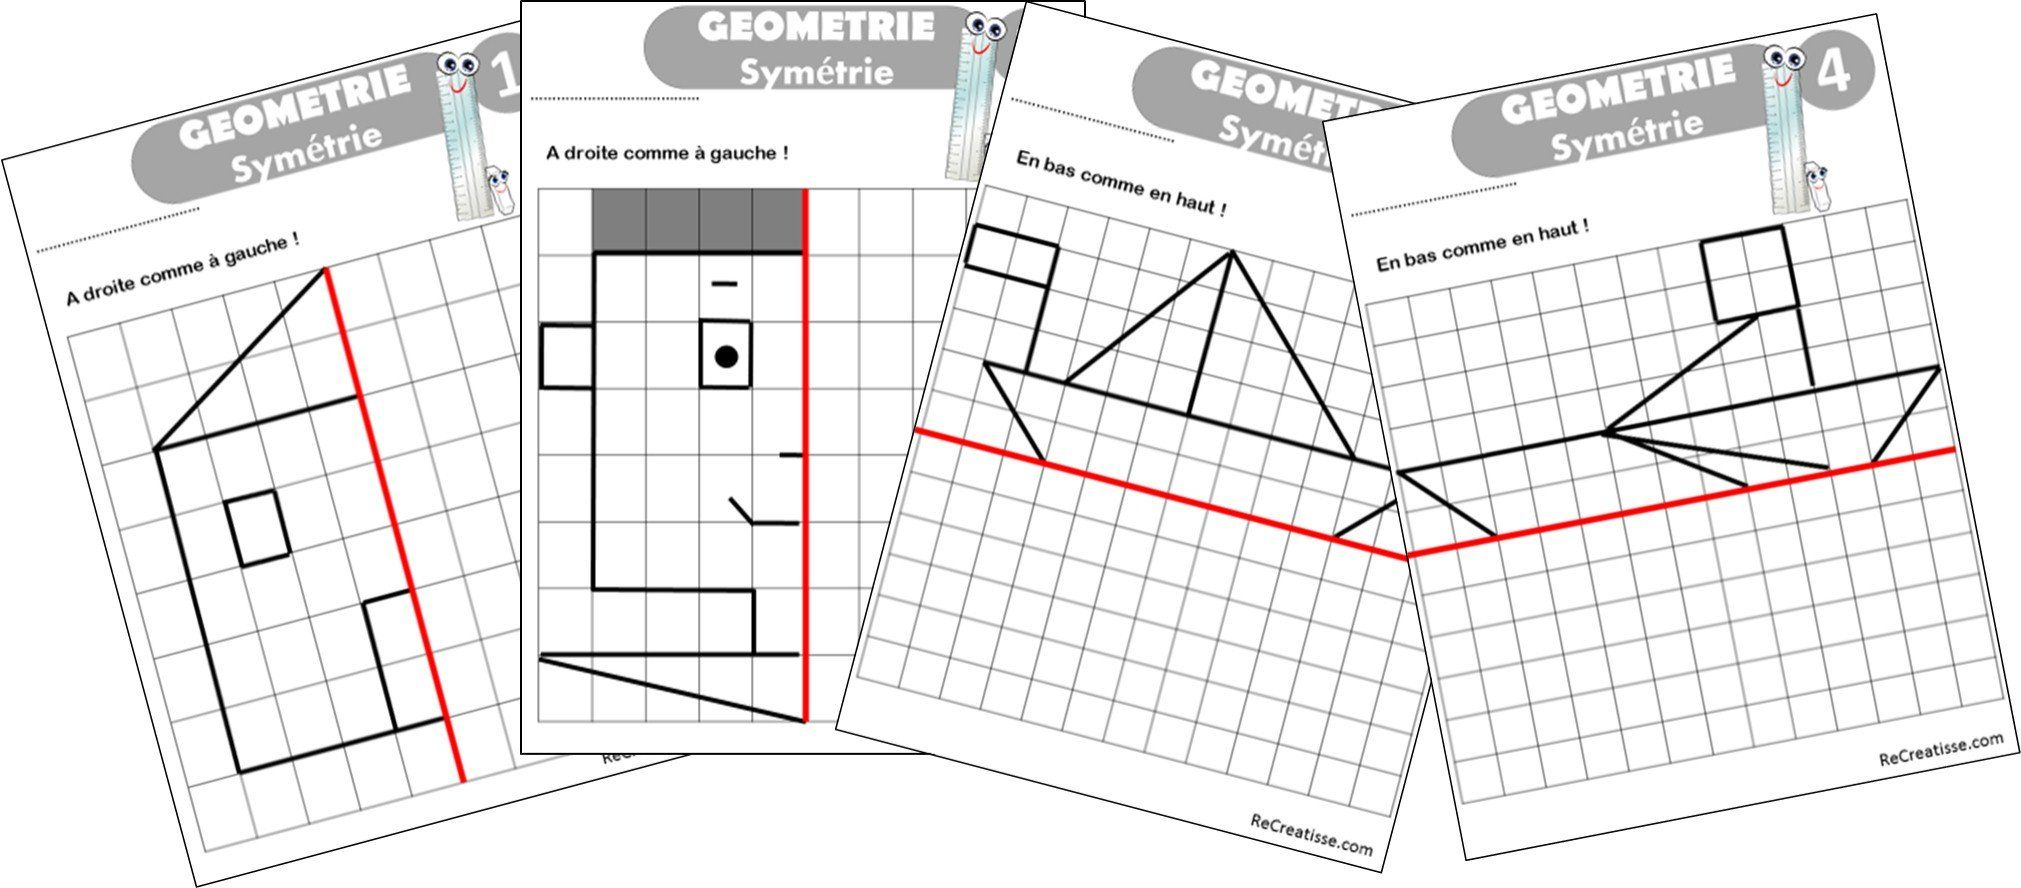 Geometrie : Ateliers Symétrie Et Exercices | Axe De Symétrie intérieur Symétrie Cm1 Exercices